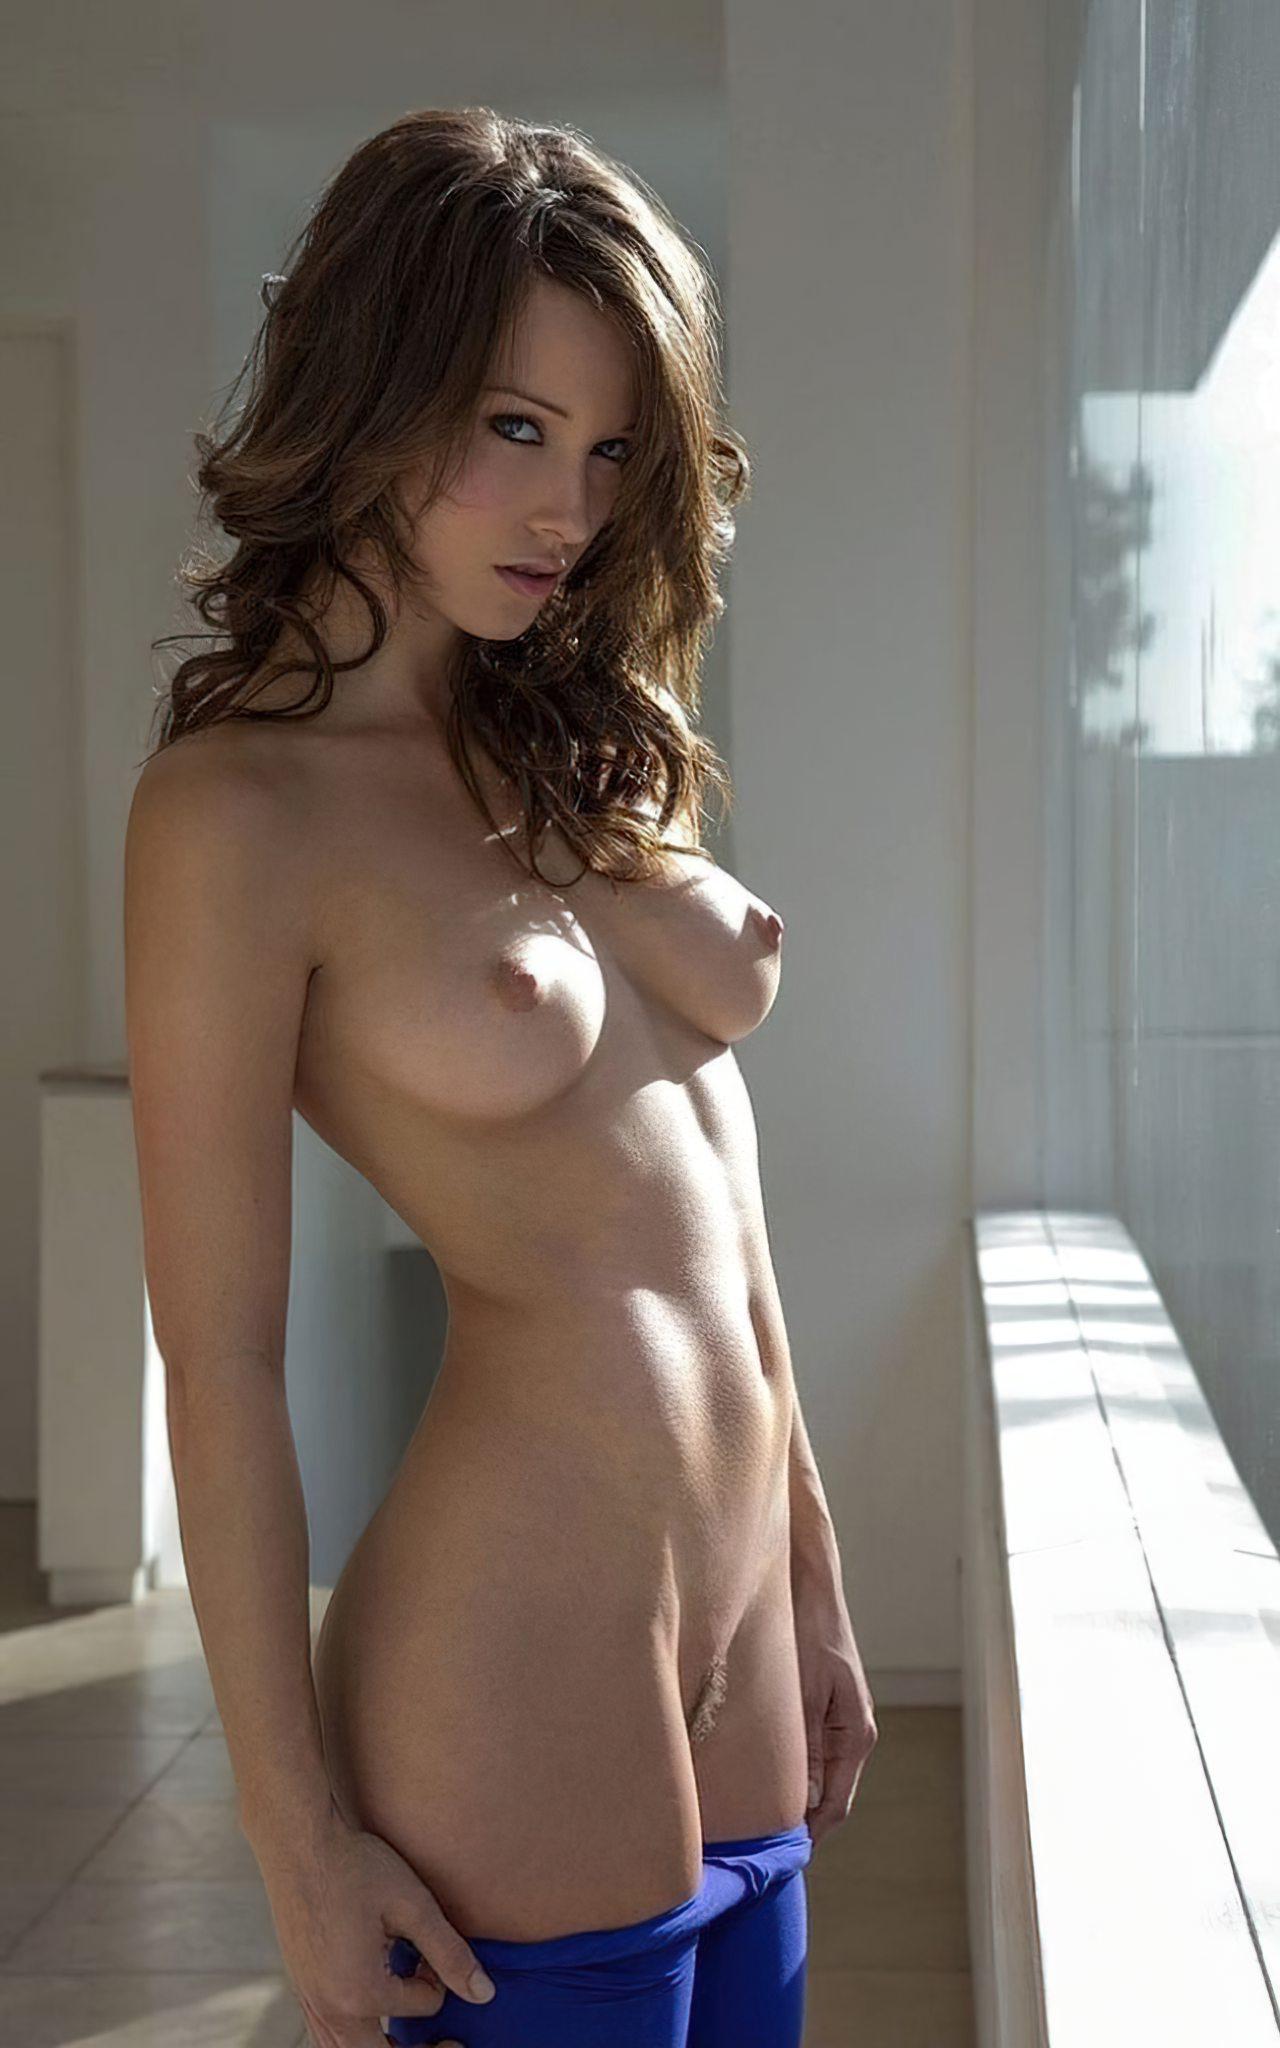 Mulher Gostosa (32)